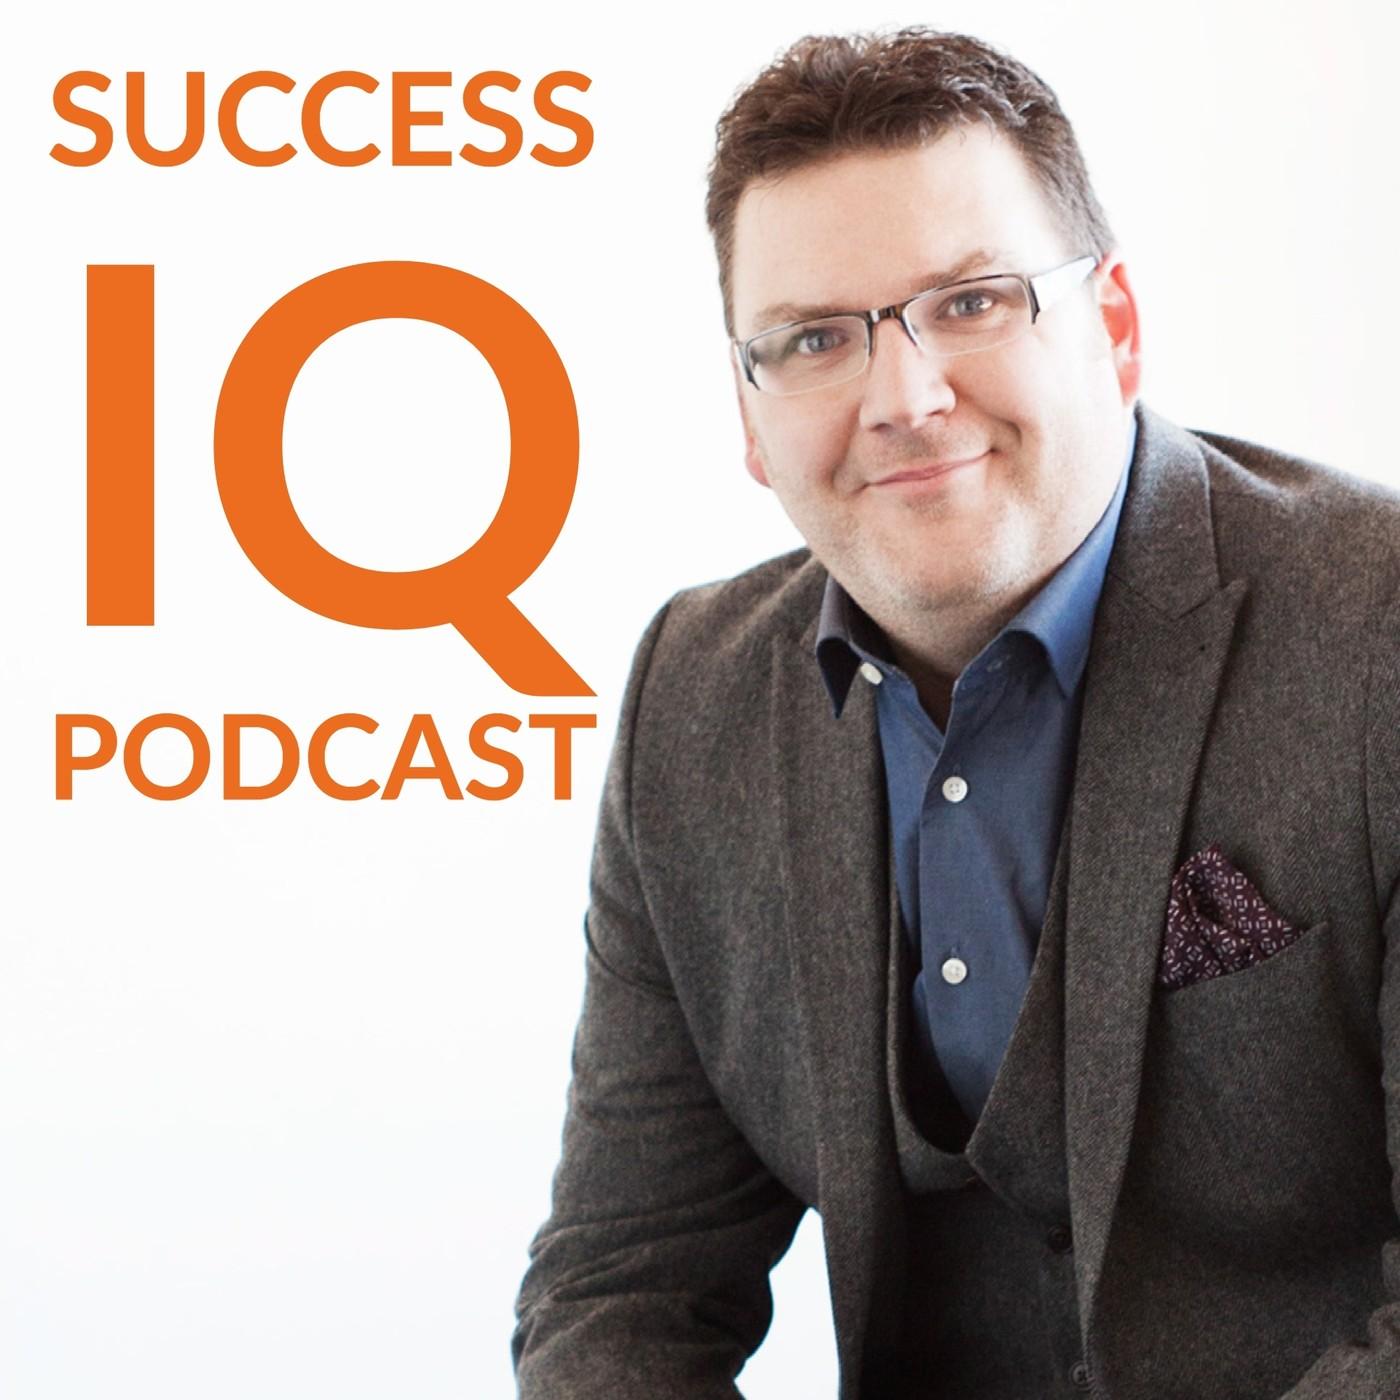 150 - Krister Ungerbock: Leadership Language Expert